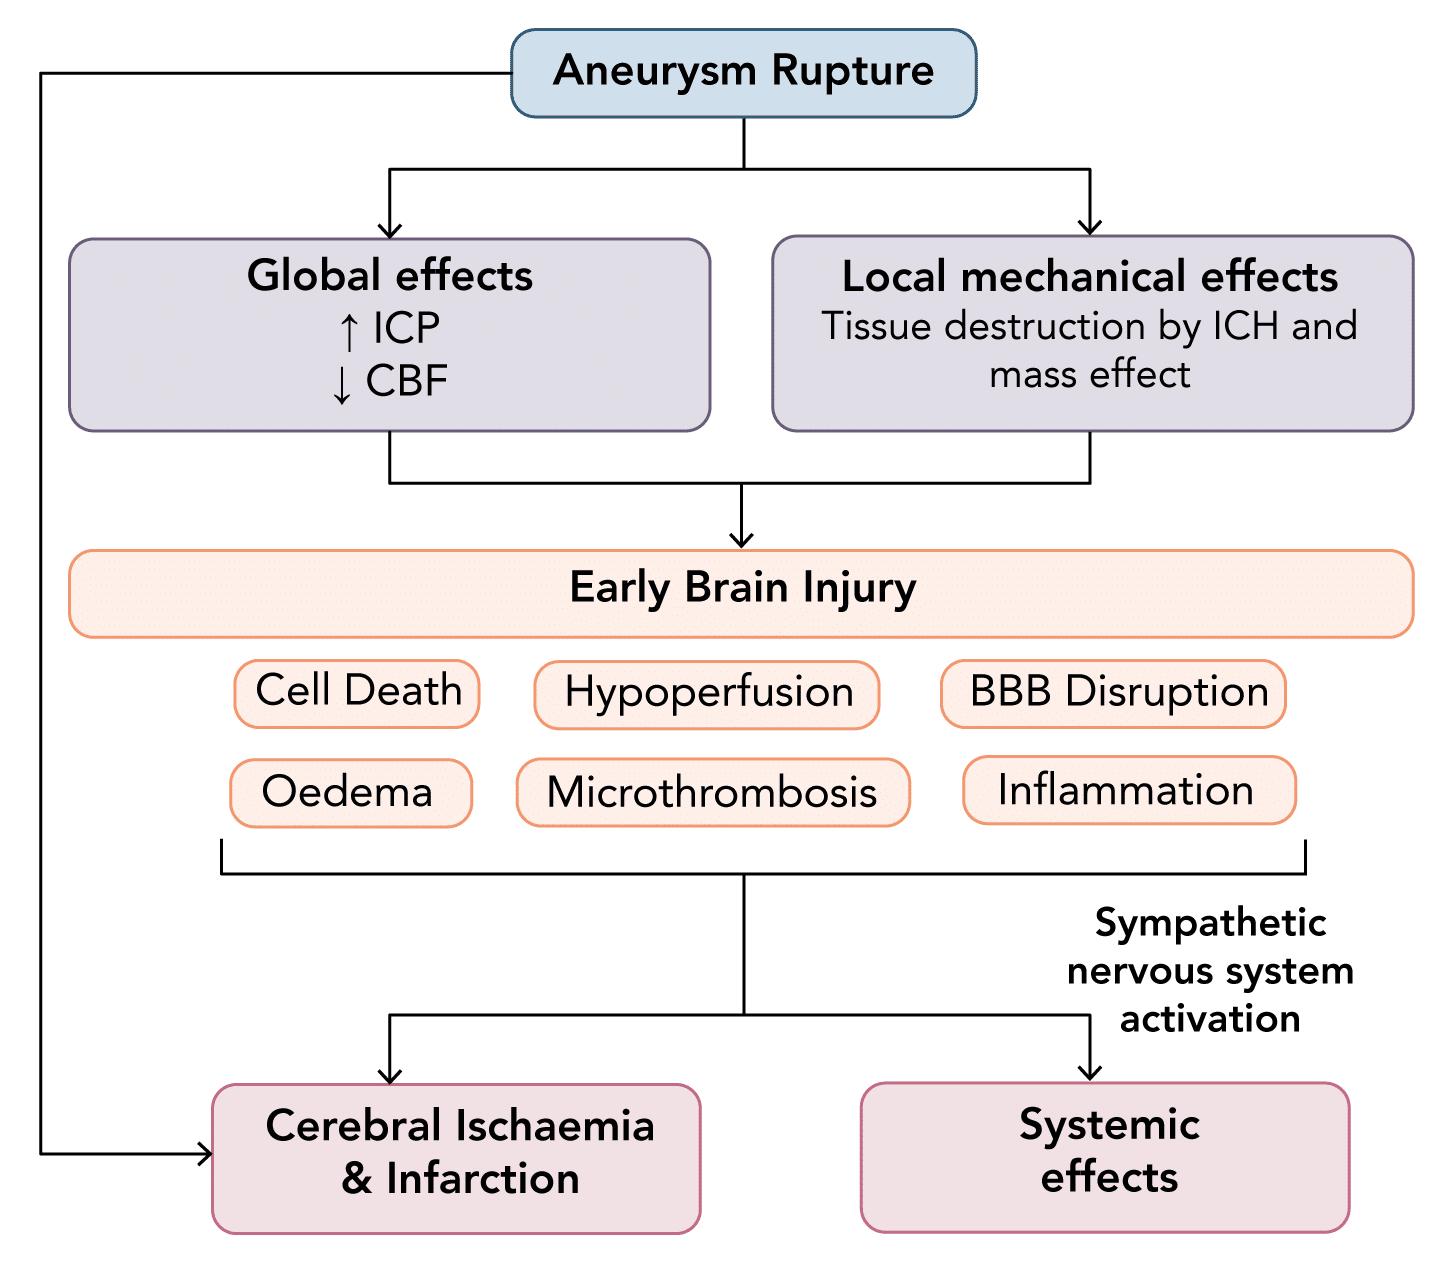 Pathophysiology leading to brain injury in subarachnoid haemorrhage (SAH)